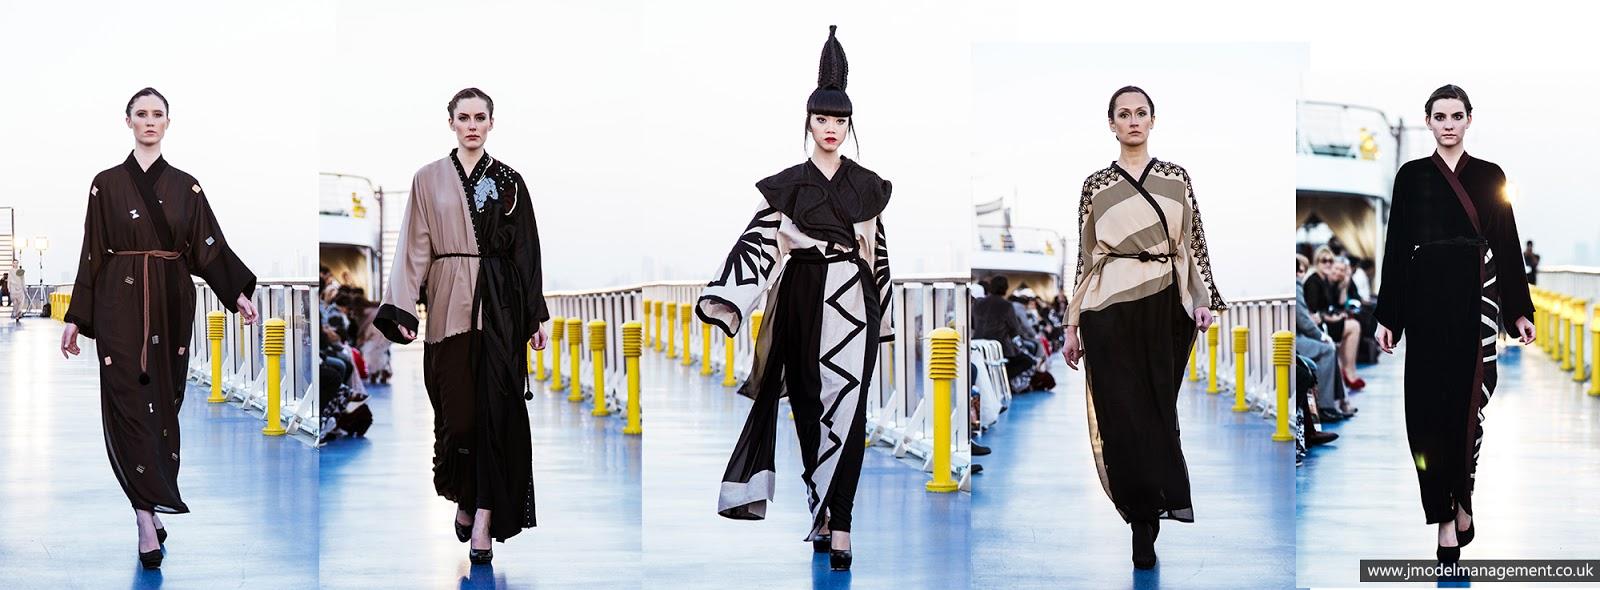 WTFSG-j-winter-fashion-show-on-costa-atlantica-Slouchy-Z